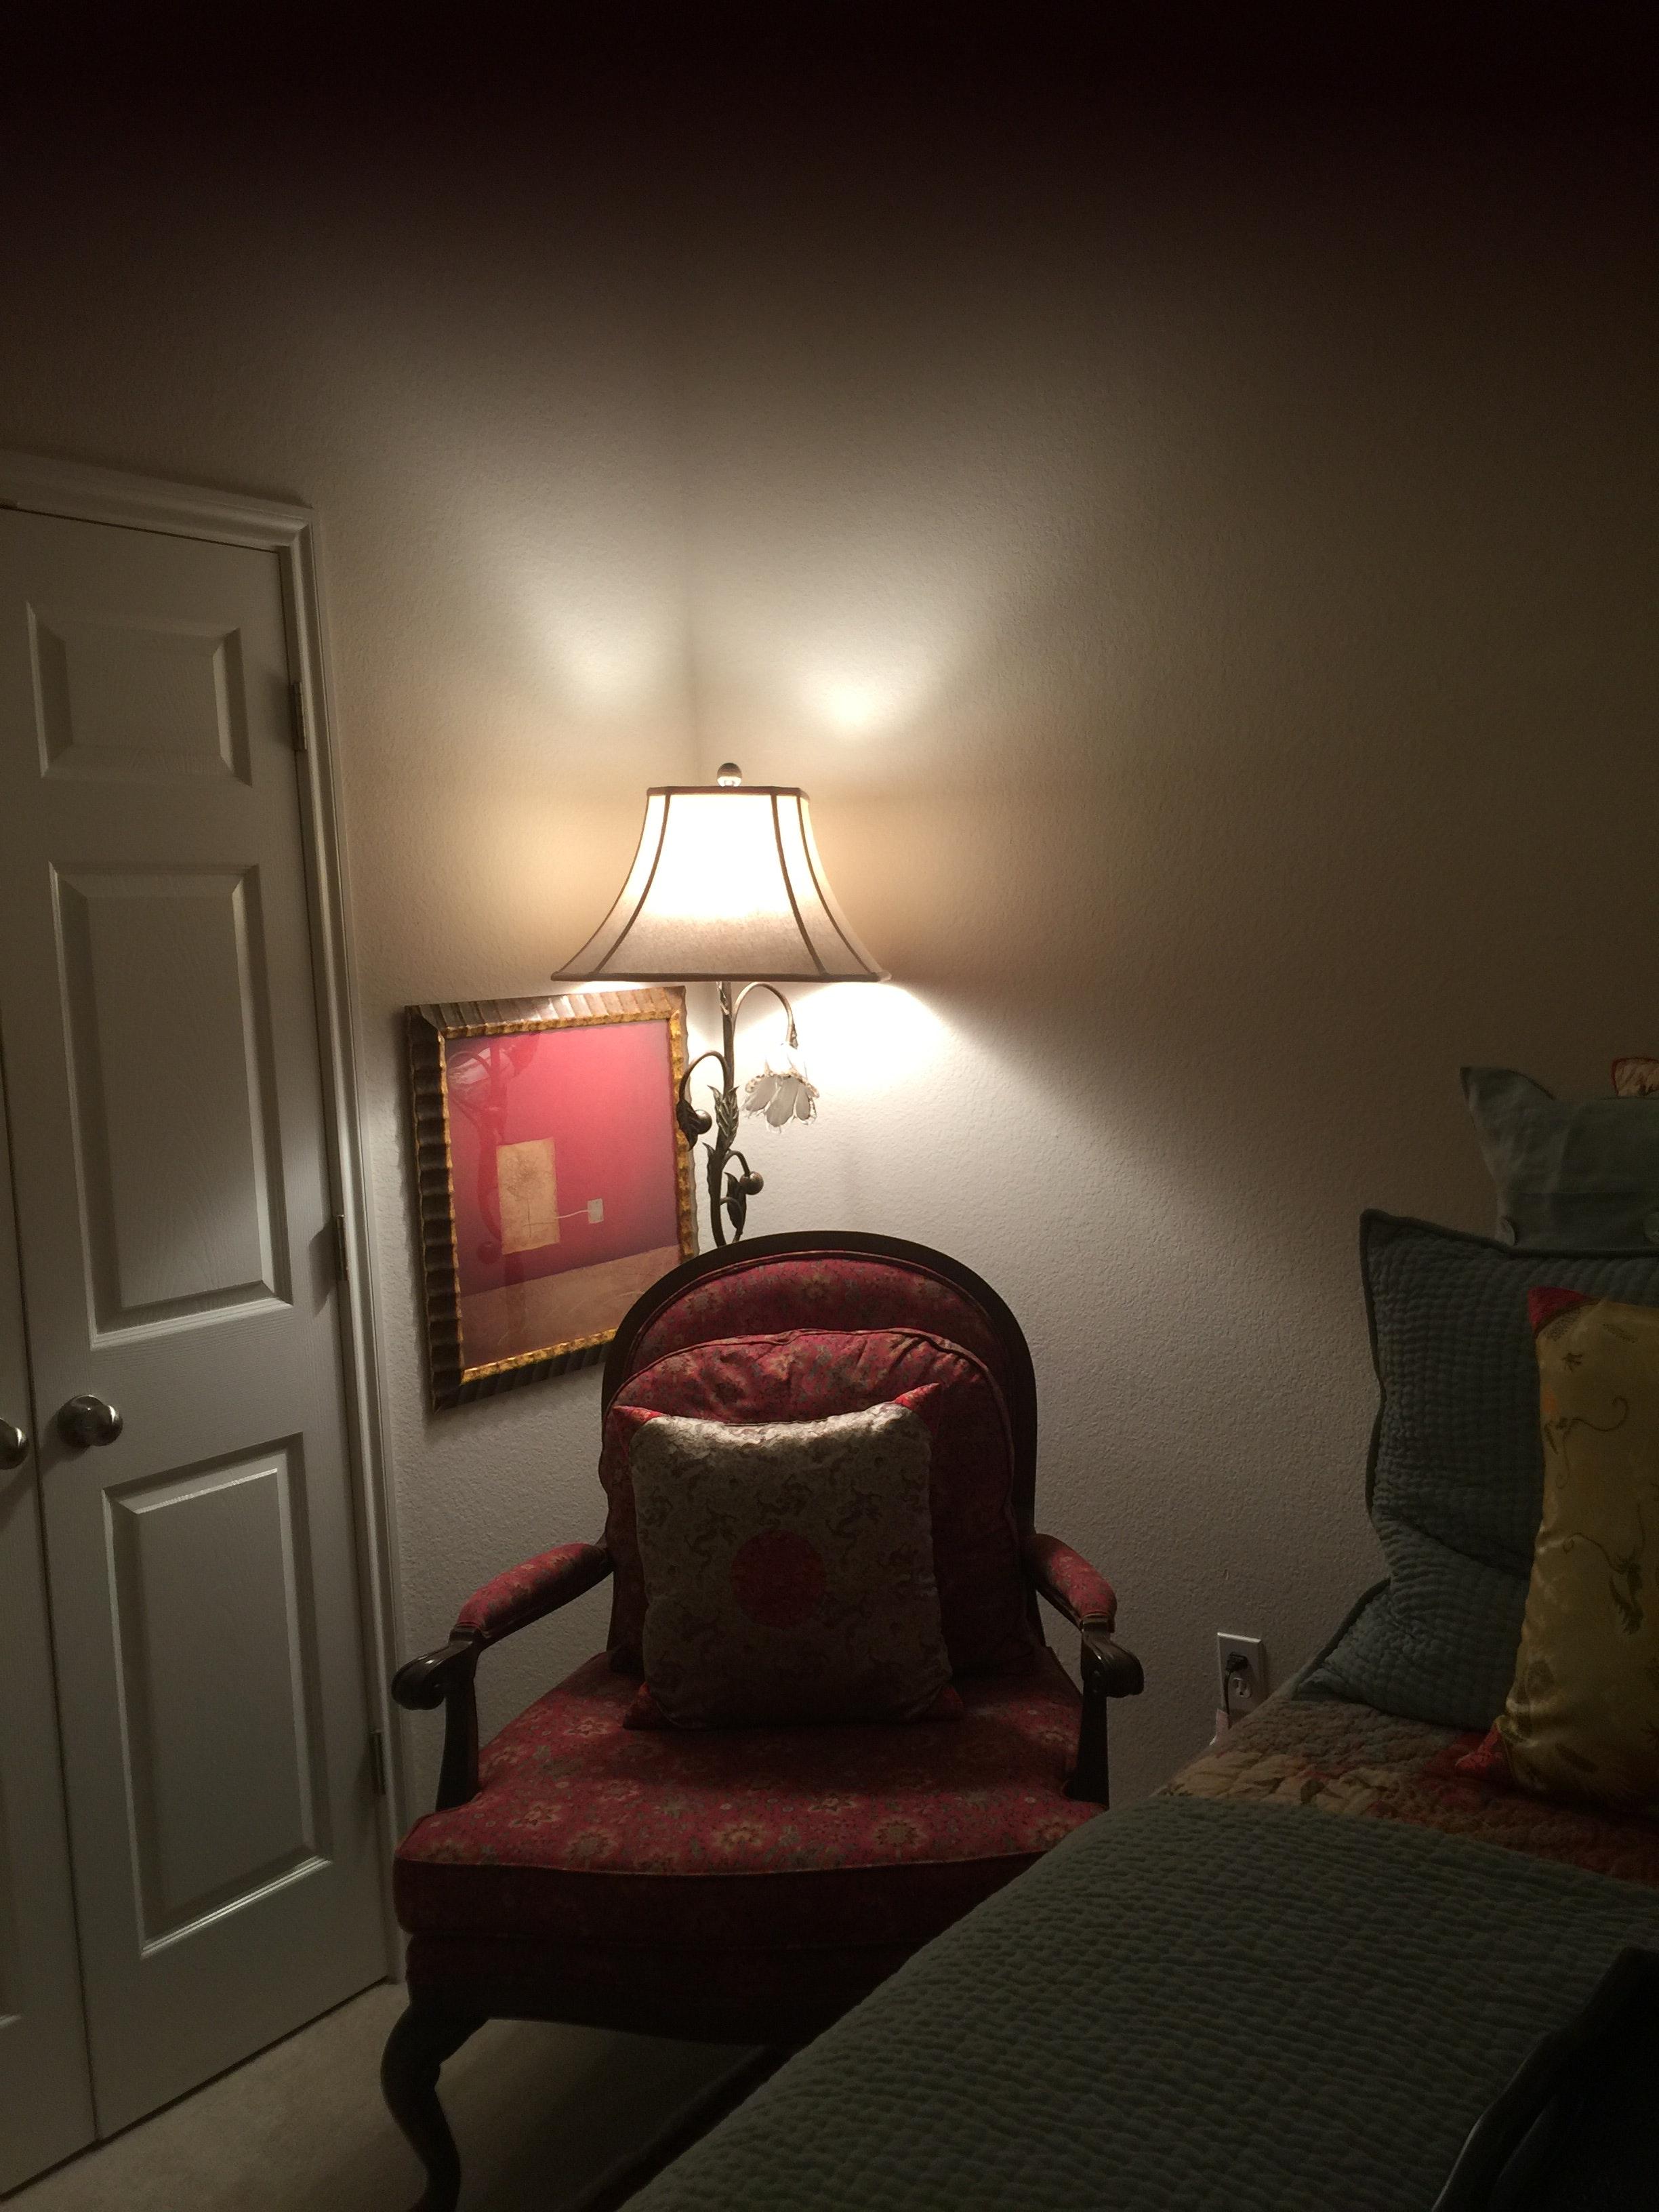 Reading area in bedroom & 1 Bedroom for a traveling nurse in Round Rock Texas | Apply | Cozy